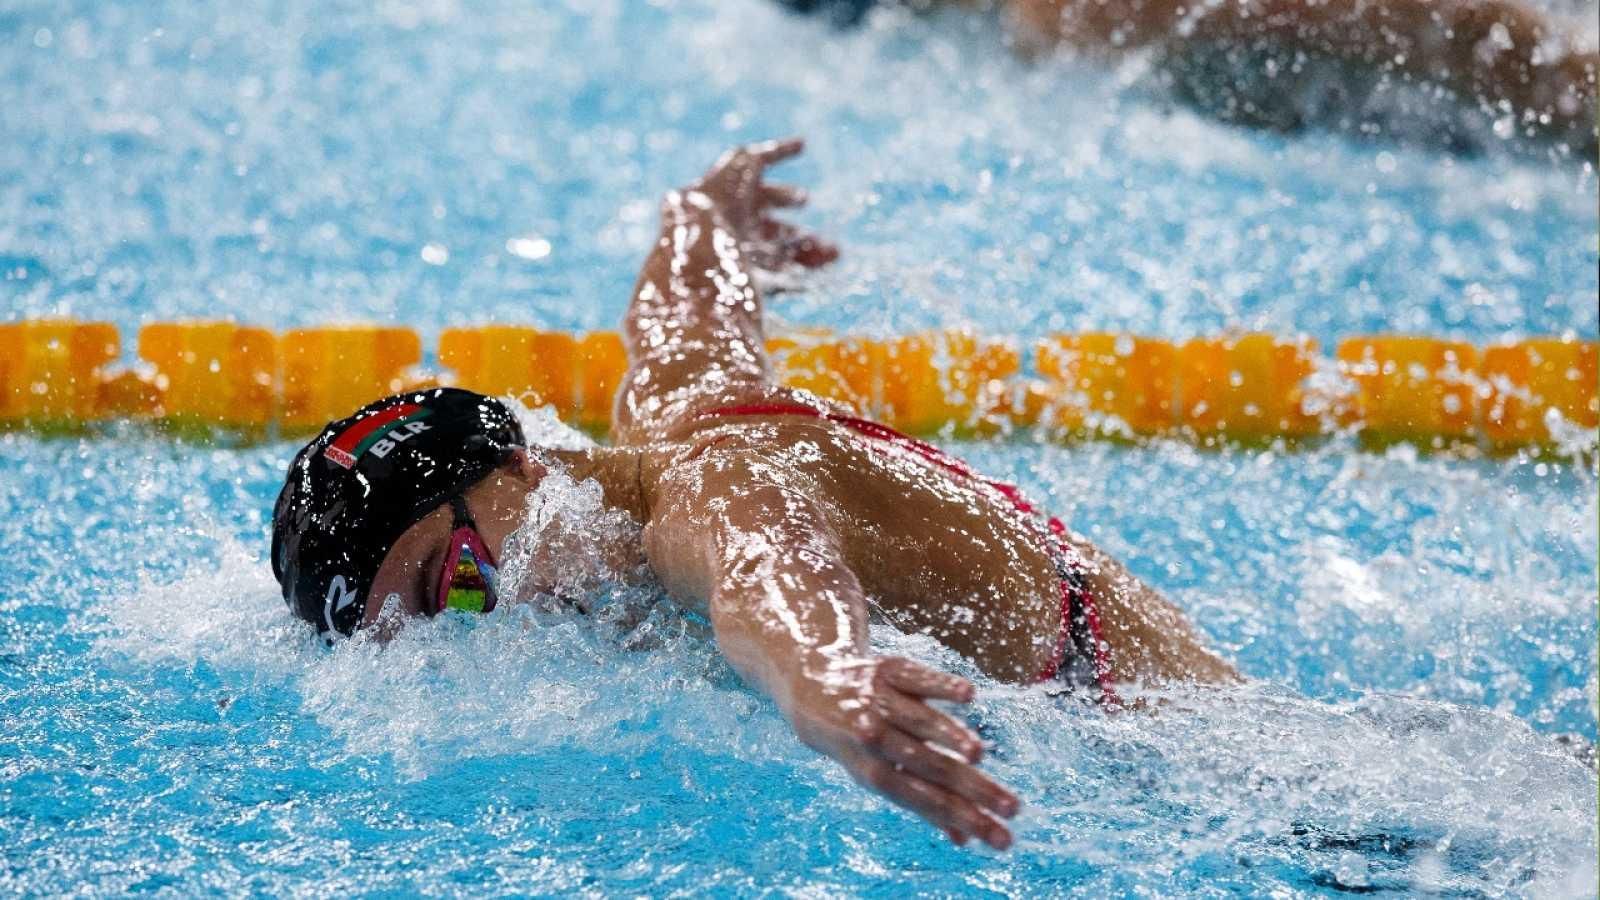 Natación - Campeonato de Europa en piscina corta. Sesión vespertina - 08/12/19 - ver ahora